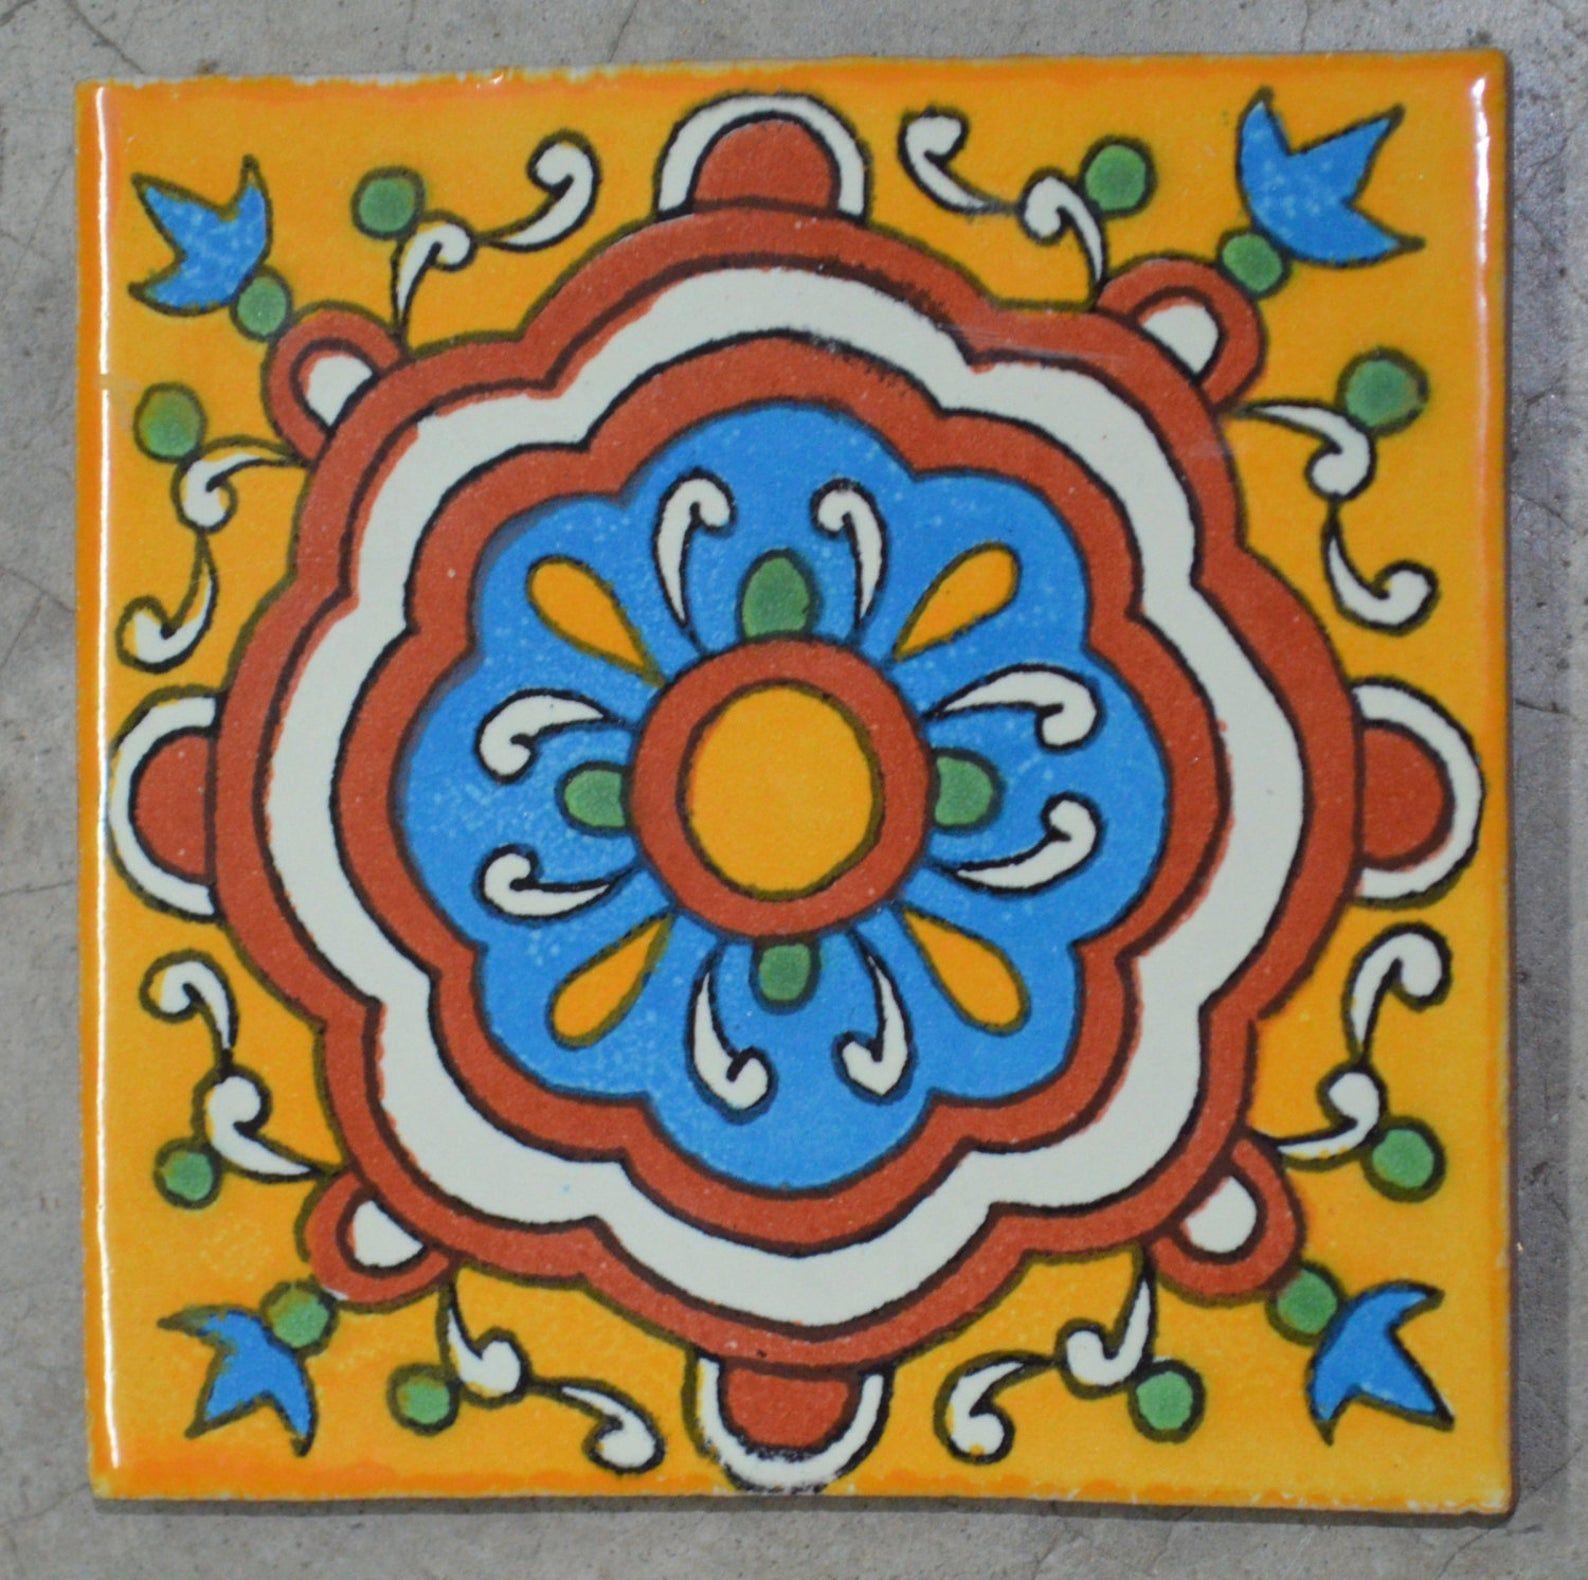 12 Mexican Talavera Tiles Handmade Hand Painted 4 X Etsy In 2020 Talavera Tiles Mexican Talavera Talavera